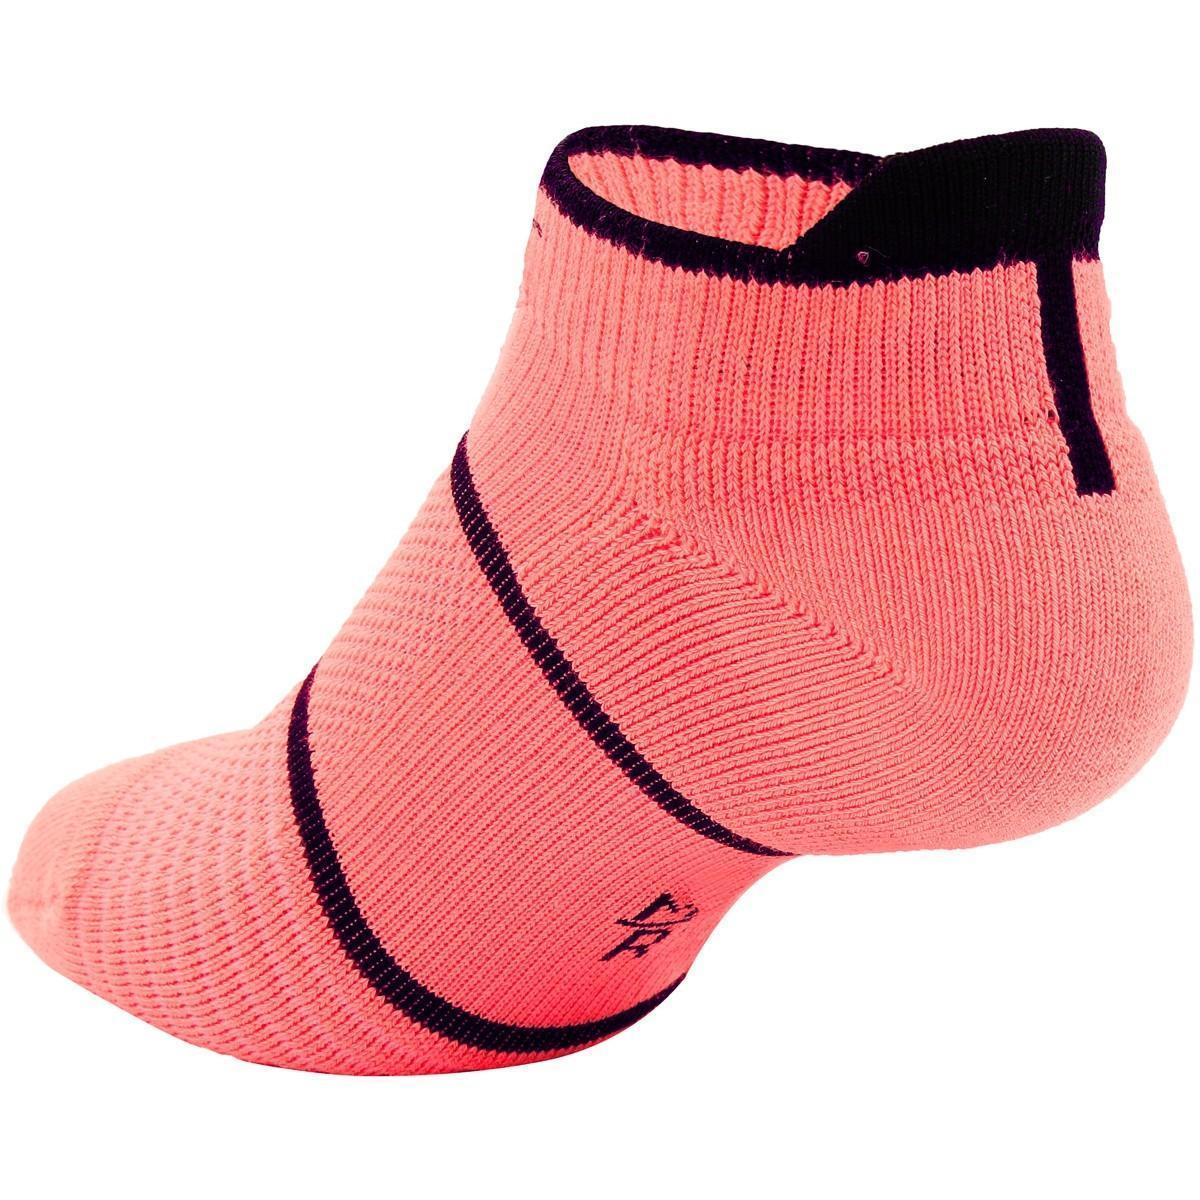 Носки теннисные Nike Court Essential No Show 1 пара lava glow/black